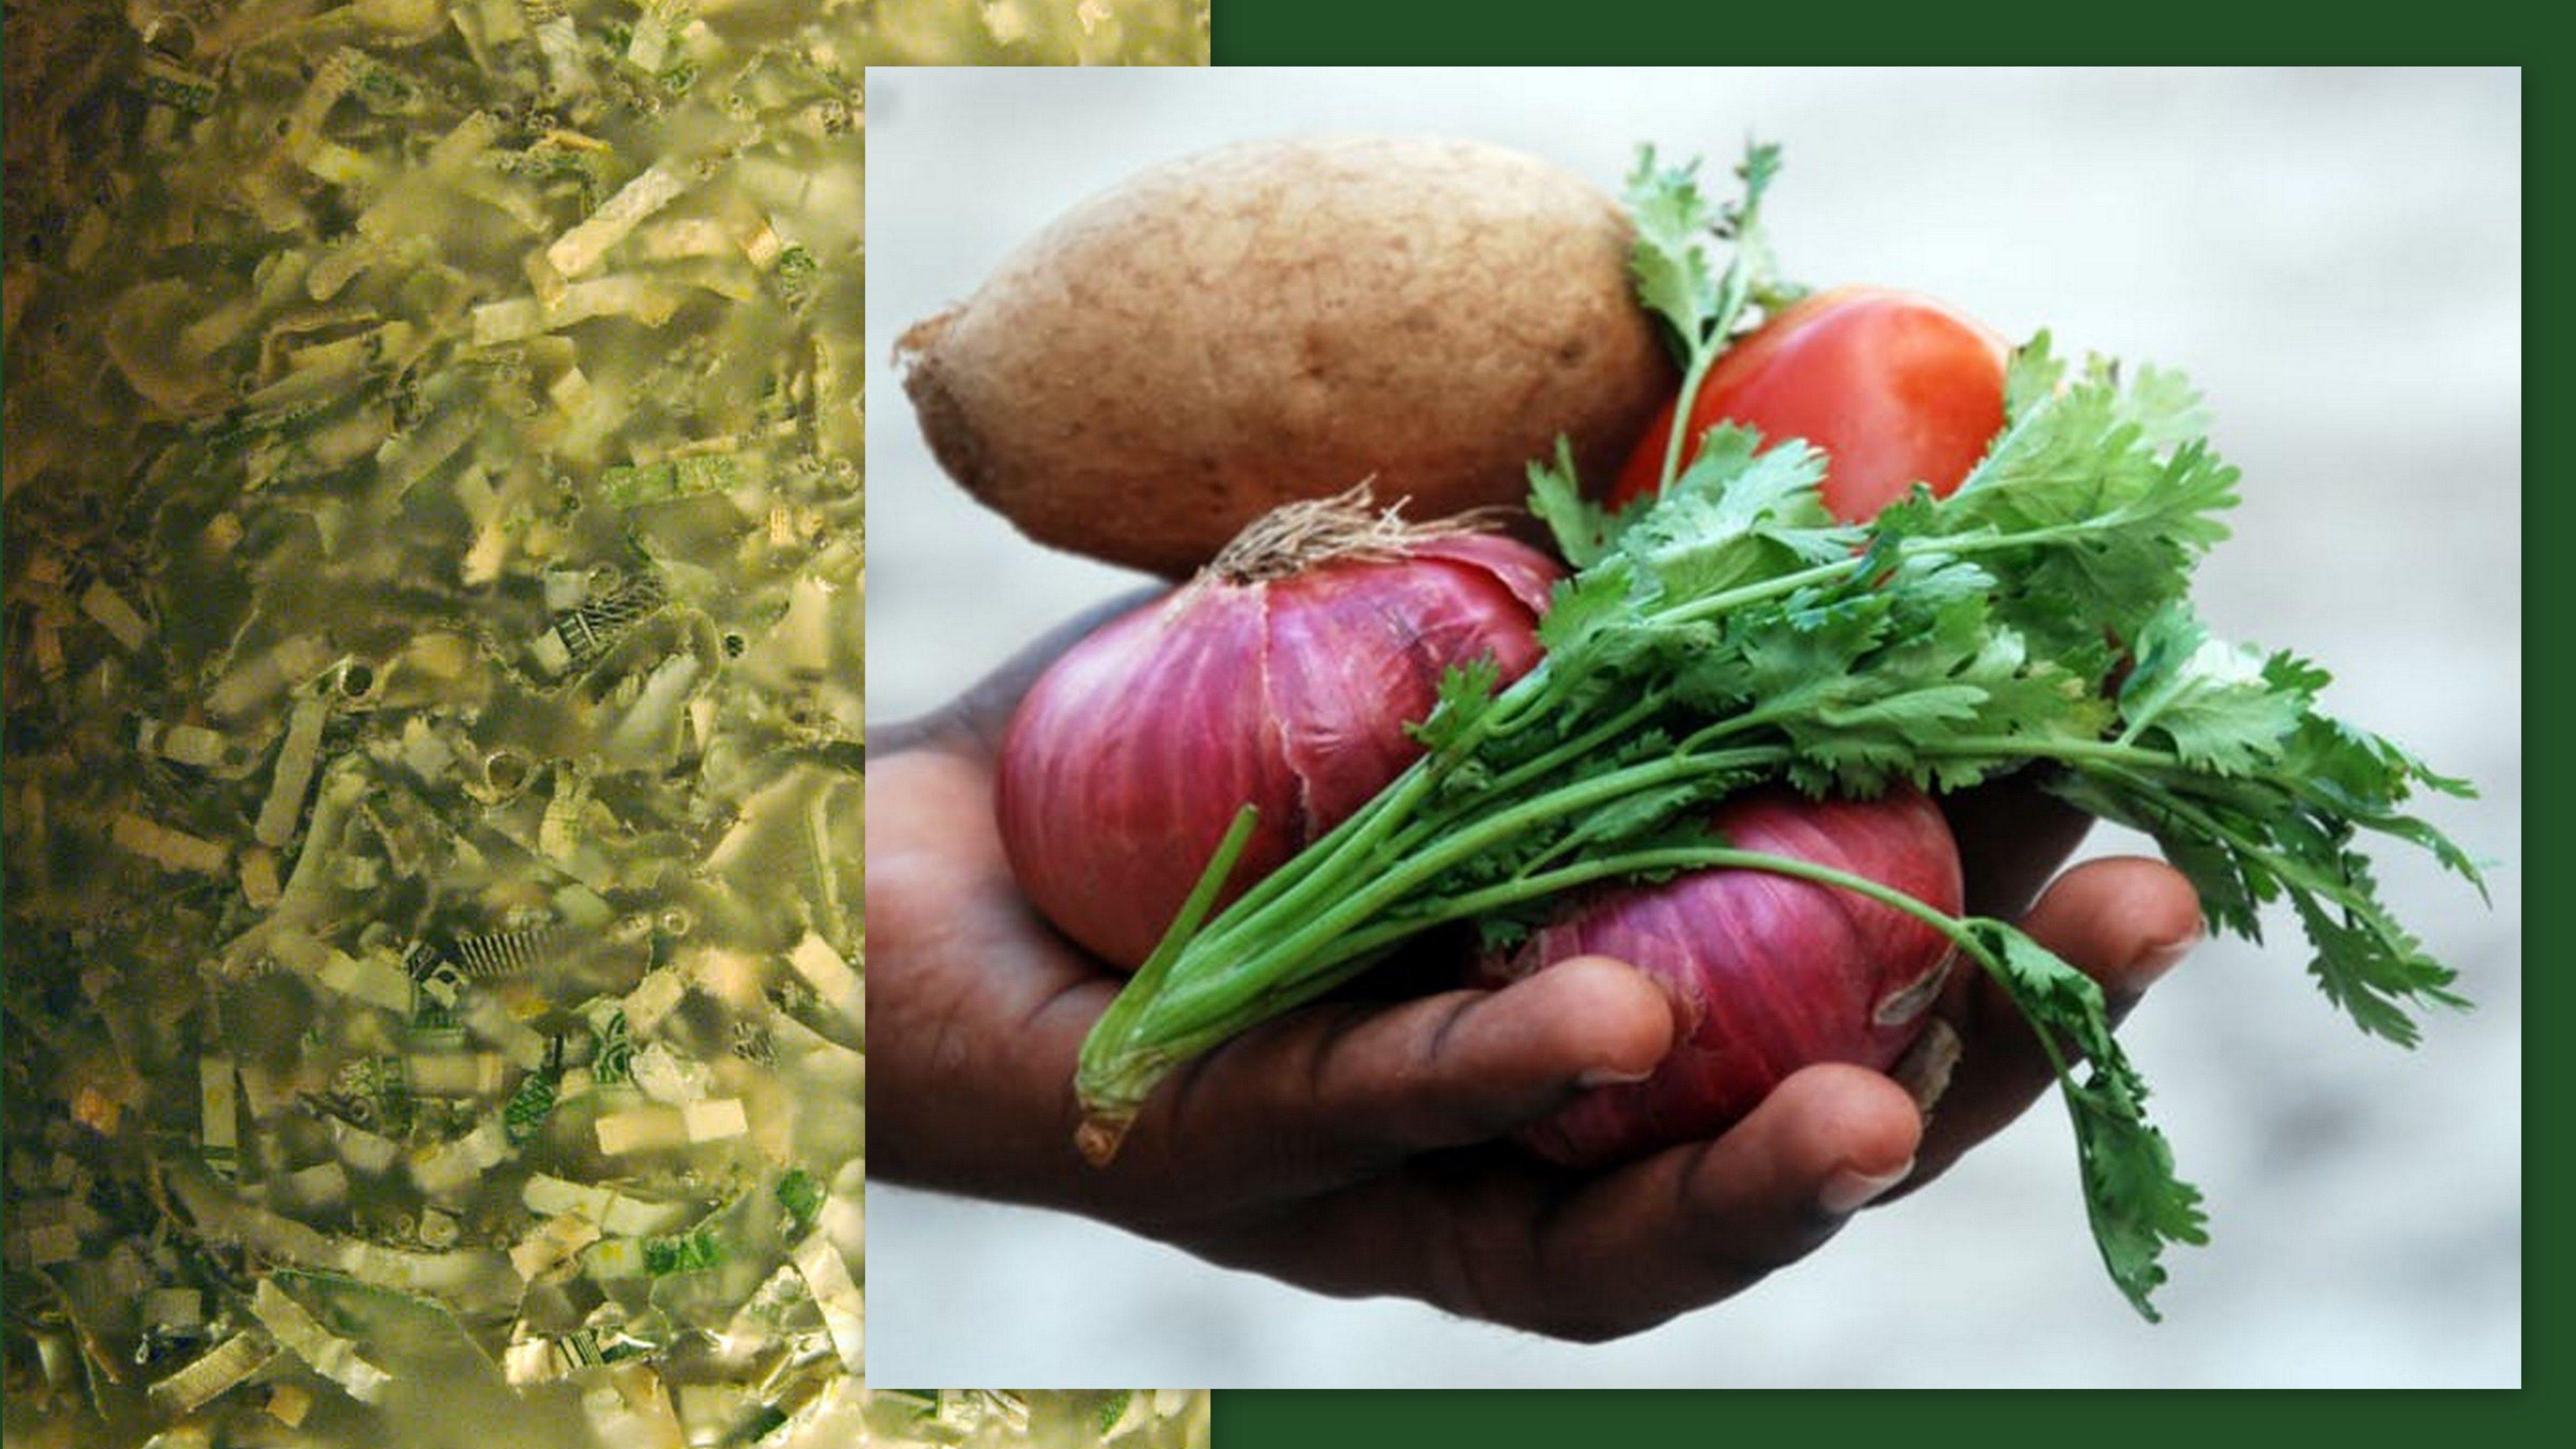 Image: Shredded Cash and handful of fresh vegetables